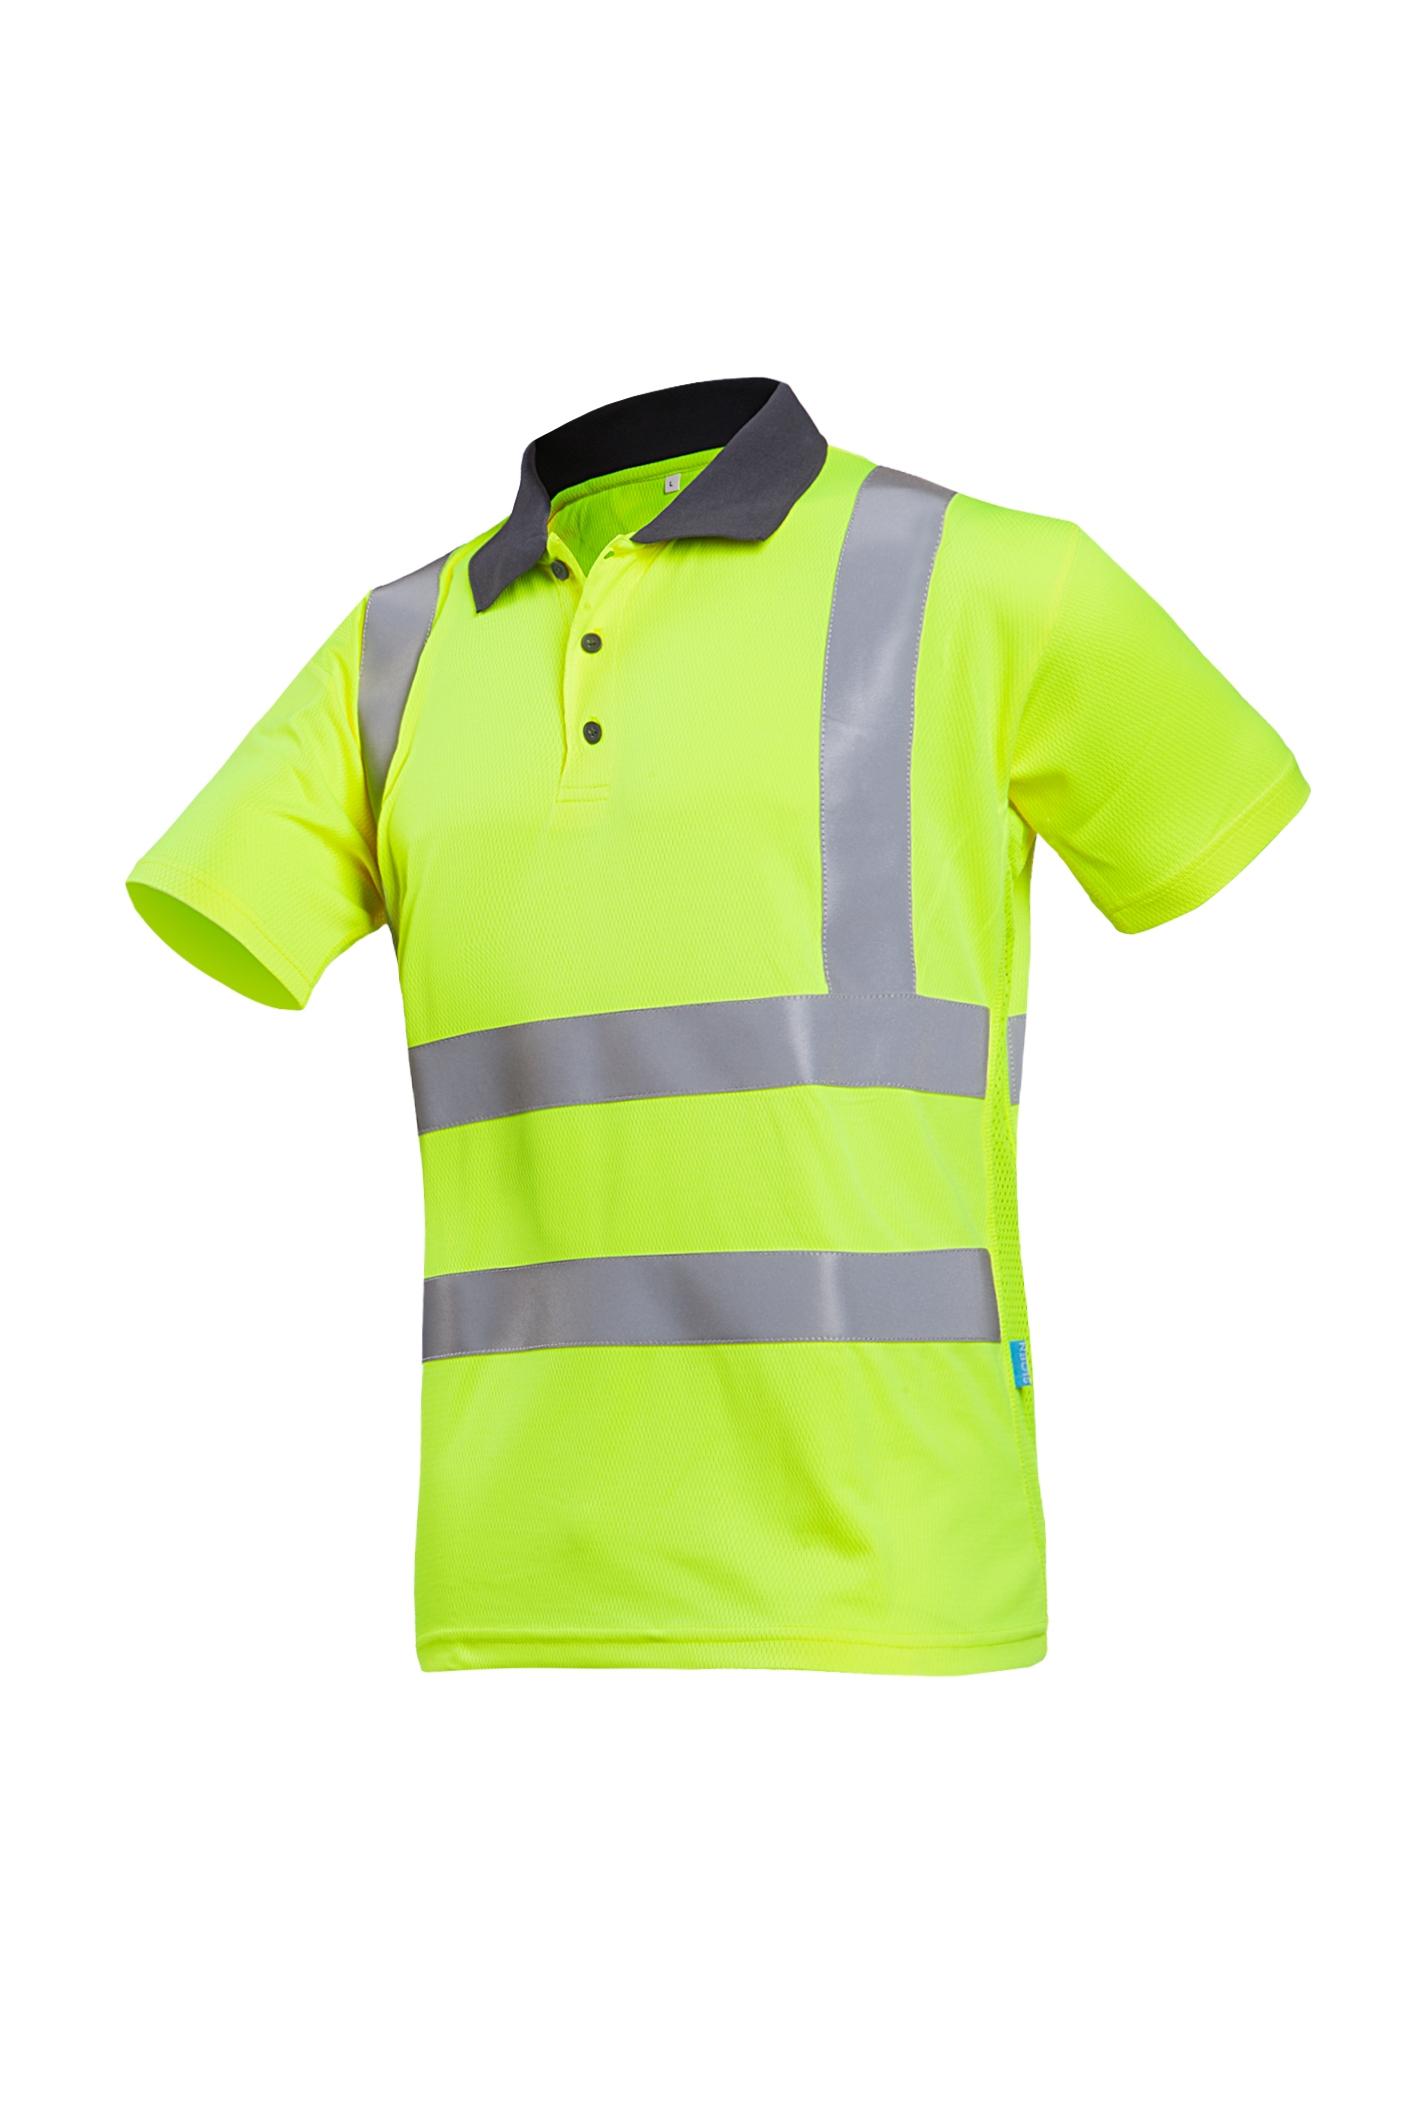 659d9dd93cd pracovní tričko POPOLA 3886 - O202009